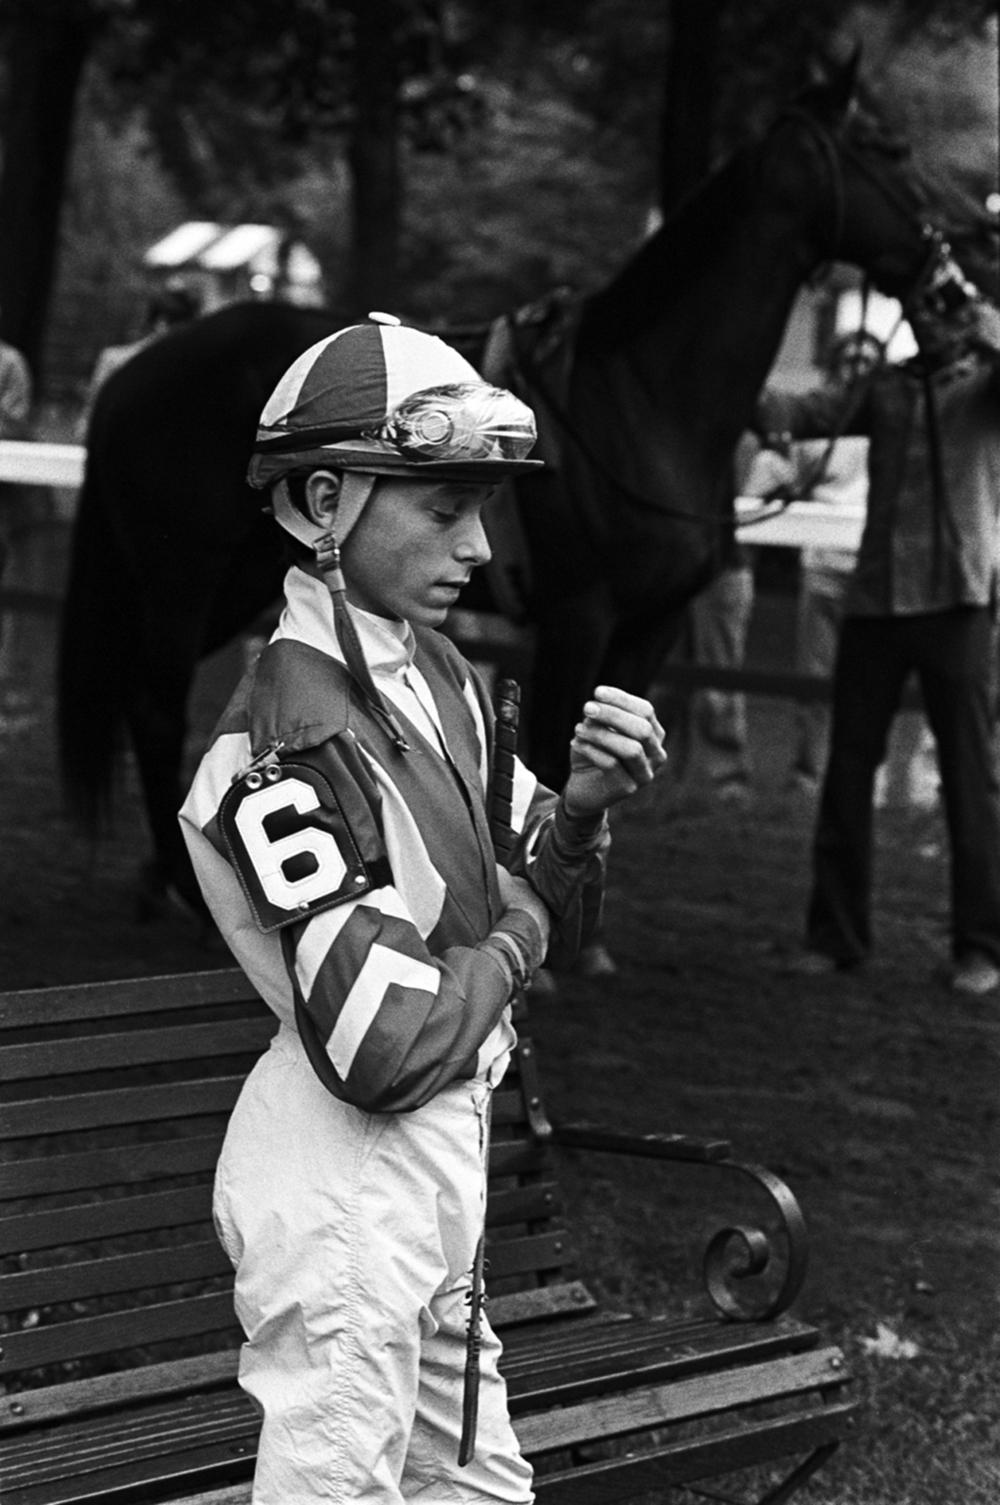 Steve Cauthen, Saratoga Race Course, Saratoga Springs, NY, 1977